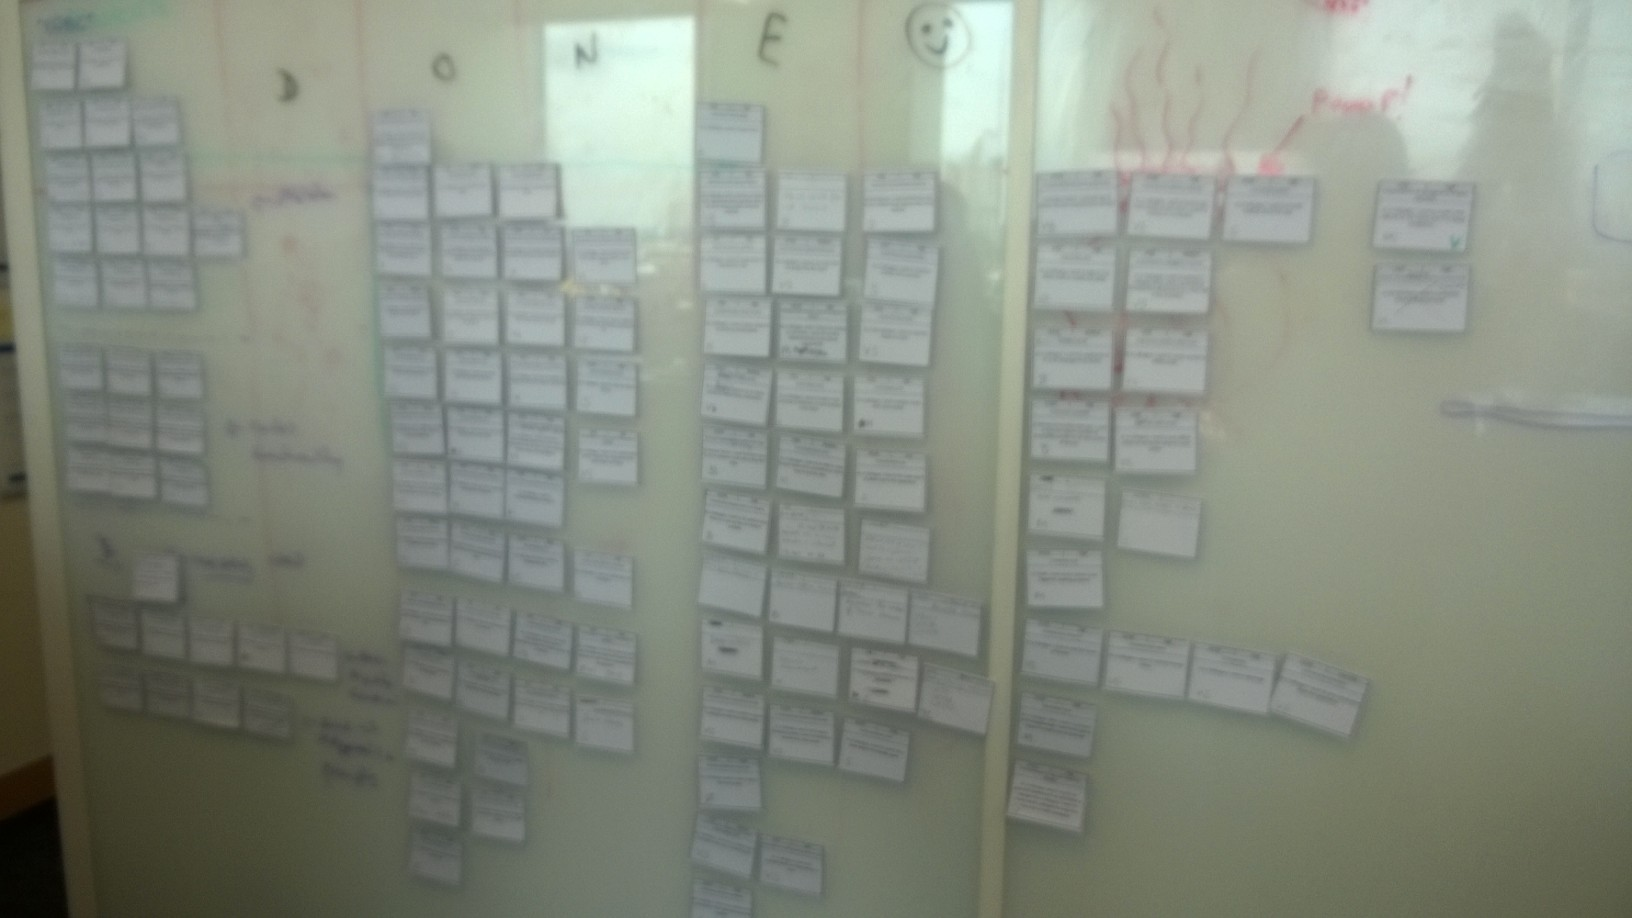 Requirements workshop output